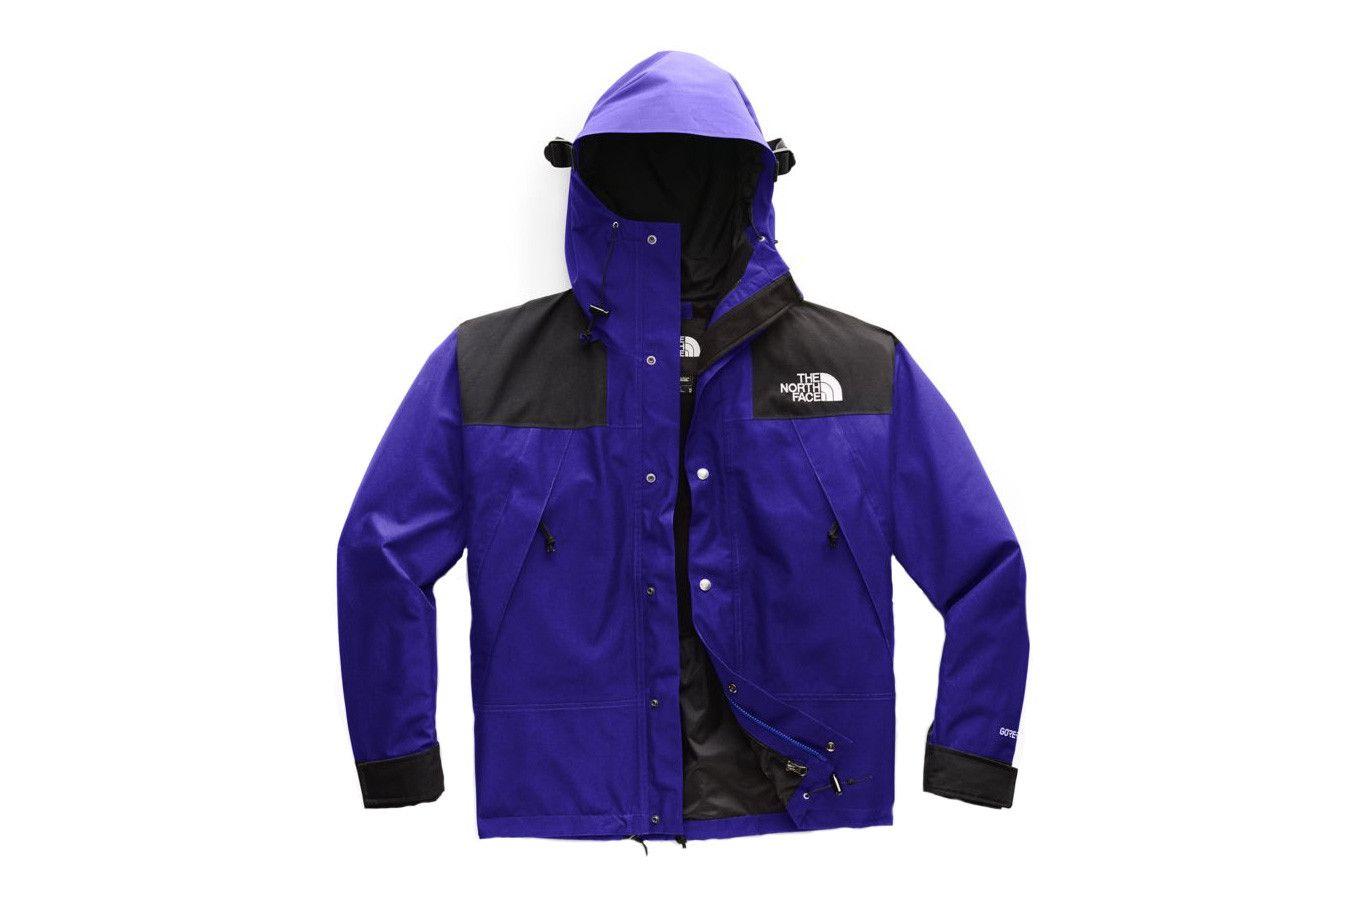 The North Face Reveals Three Striking New 1990 Mountain Jacket Gtx Colorways Mountain Jacket North Face Mens Snowboard Jacket Mens [ 908 x 1362 Pixel ]